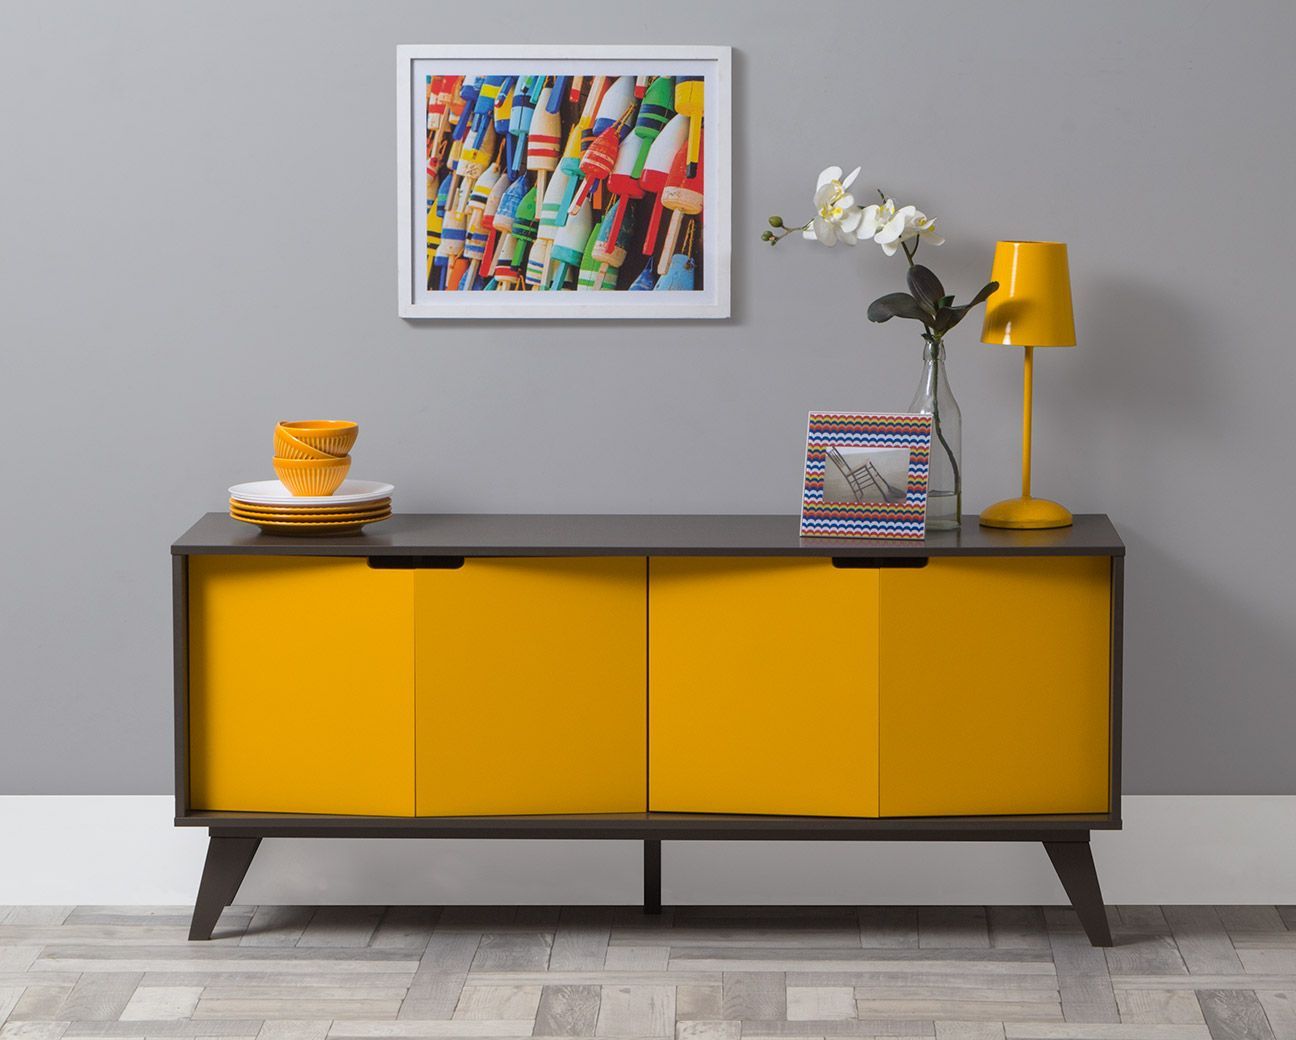 Adesivo De Madeira Para Moveis ~ Buffet Vértice 4 Portas Amarelo Aparador, Portas